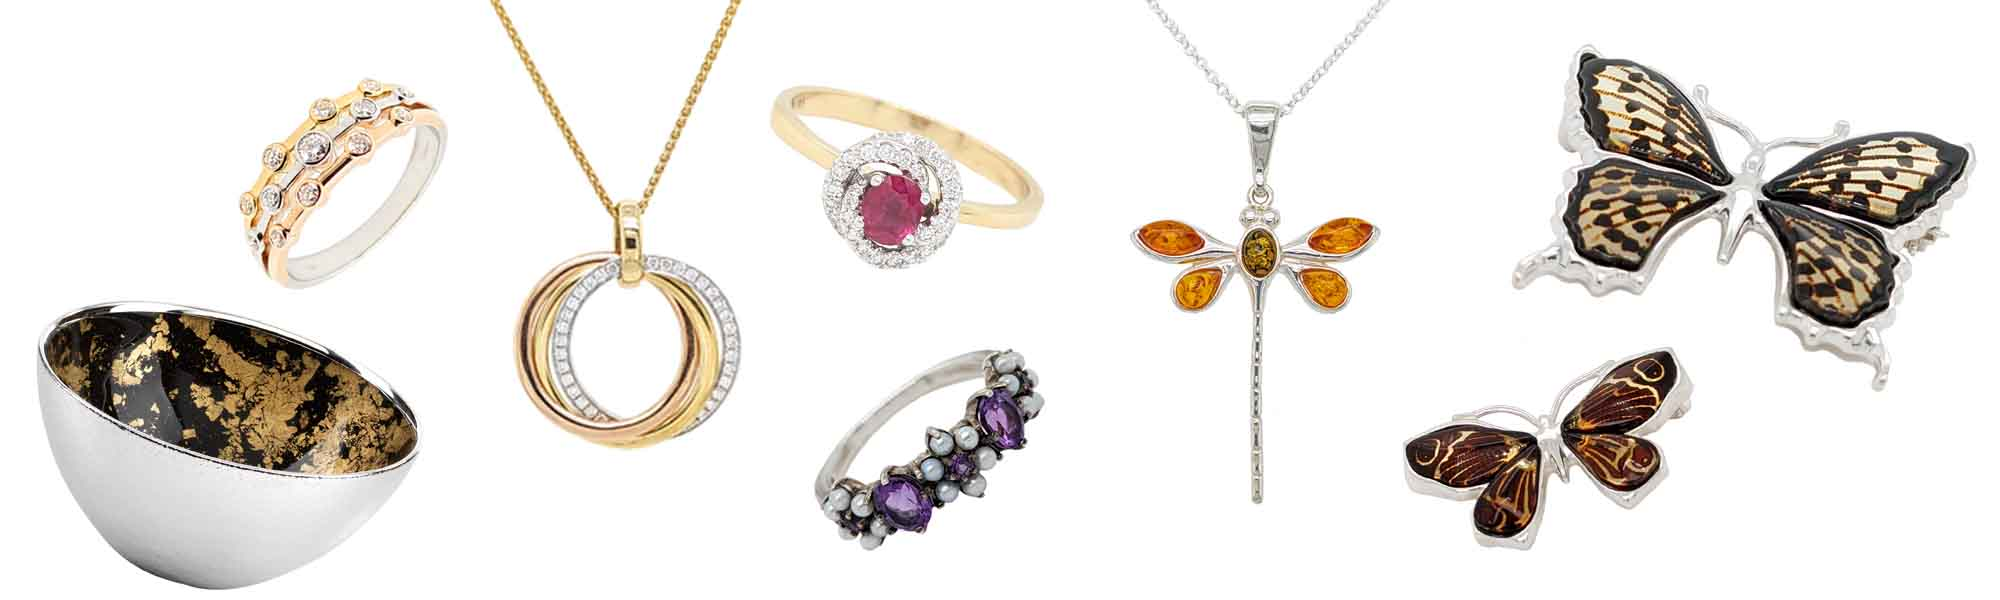 Banner Sally Thorntons Jewellery Blog On Christmas Gift Ideas From Thornton Jewellers Kettering Northampton Aa Thornton Jeweller